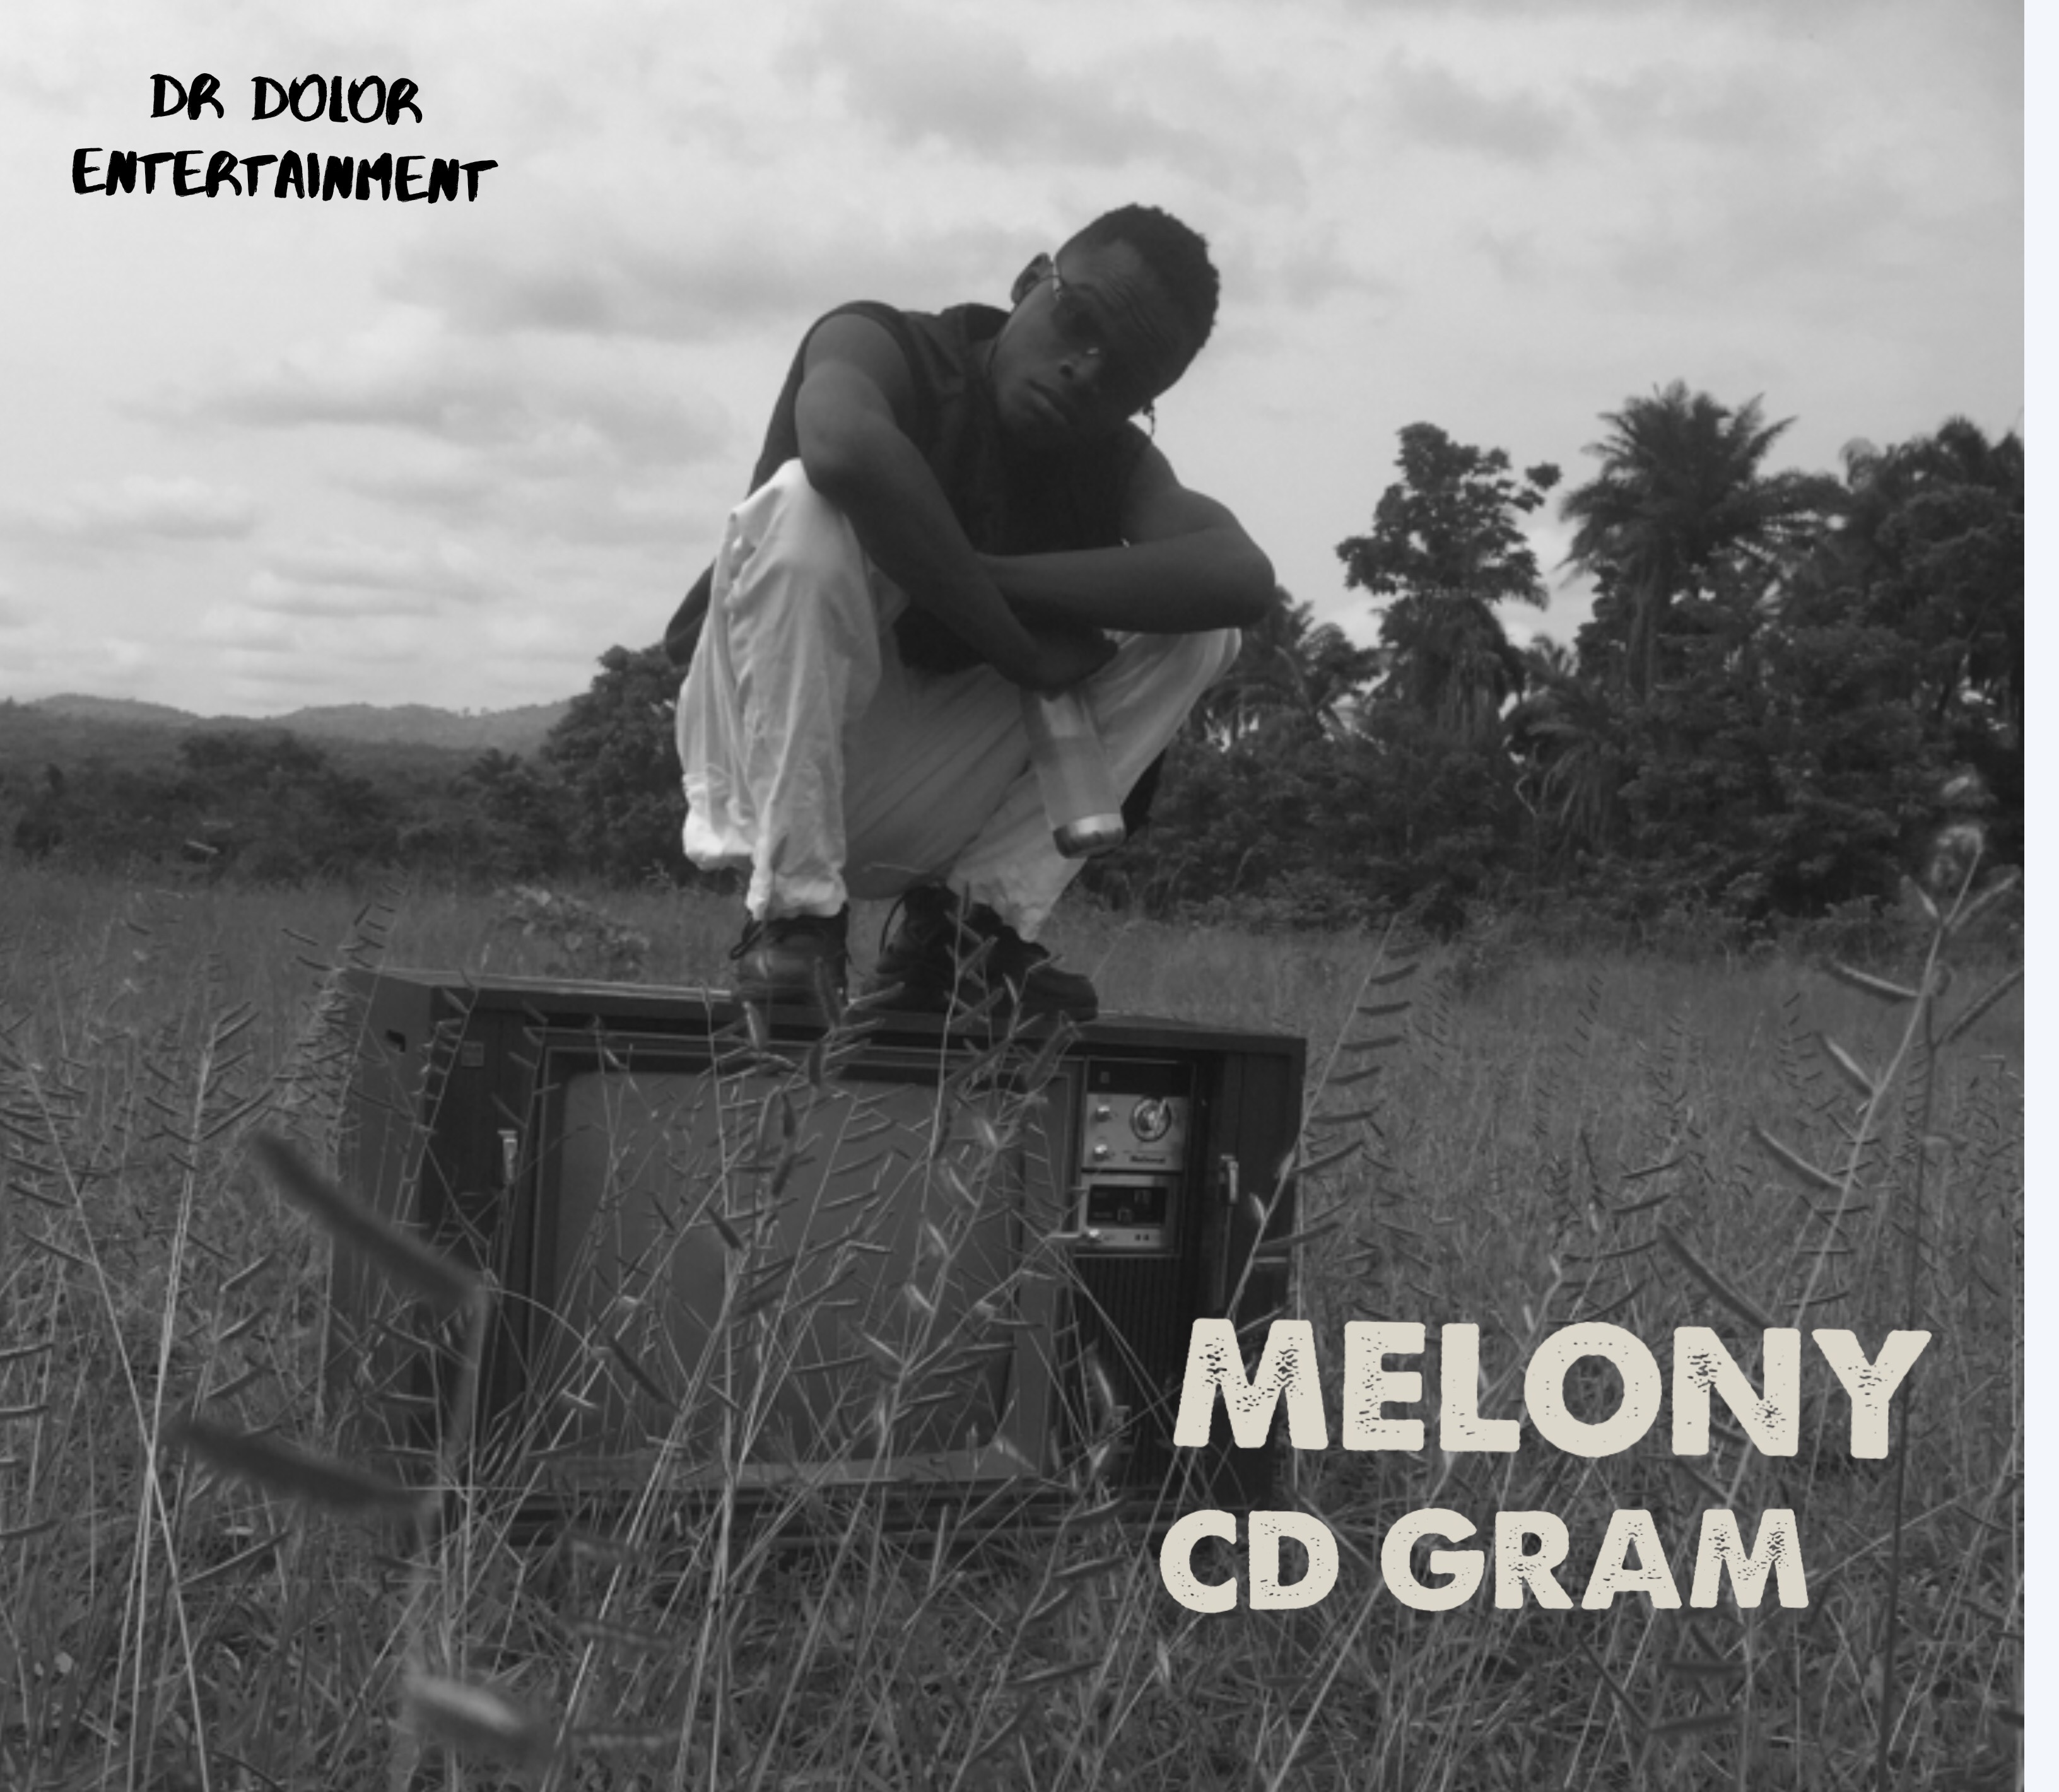 CDgram - MELONY